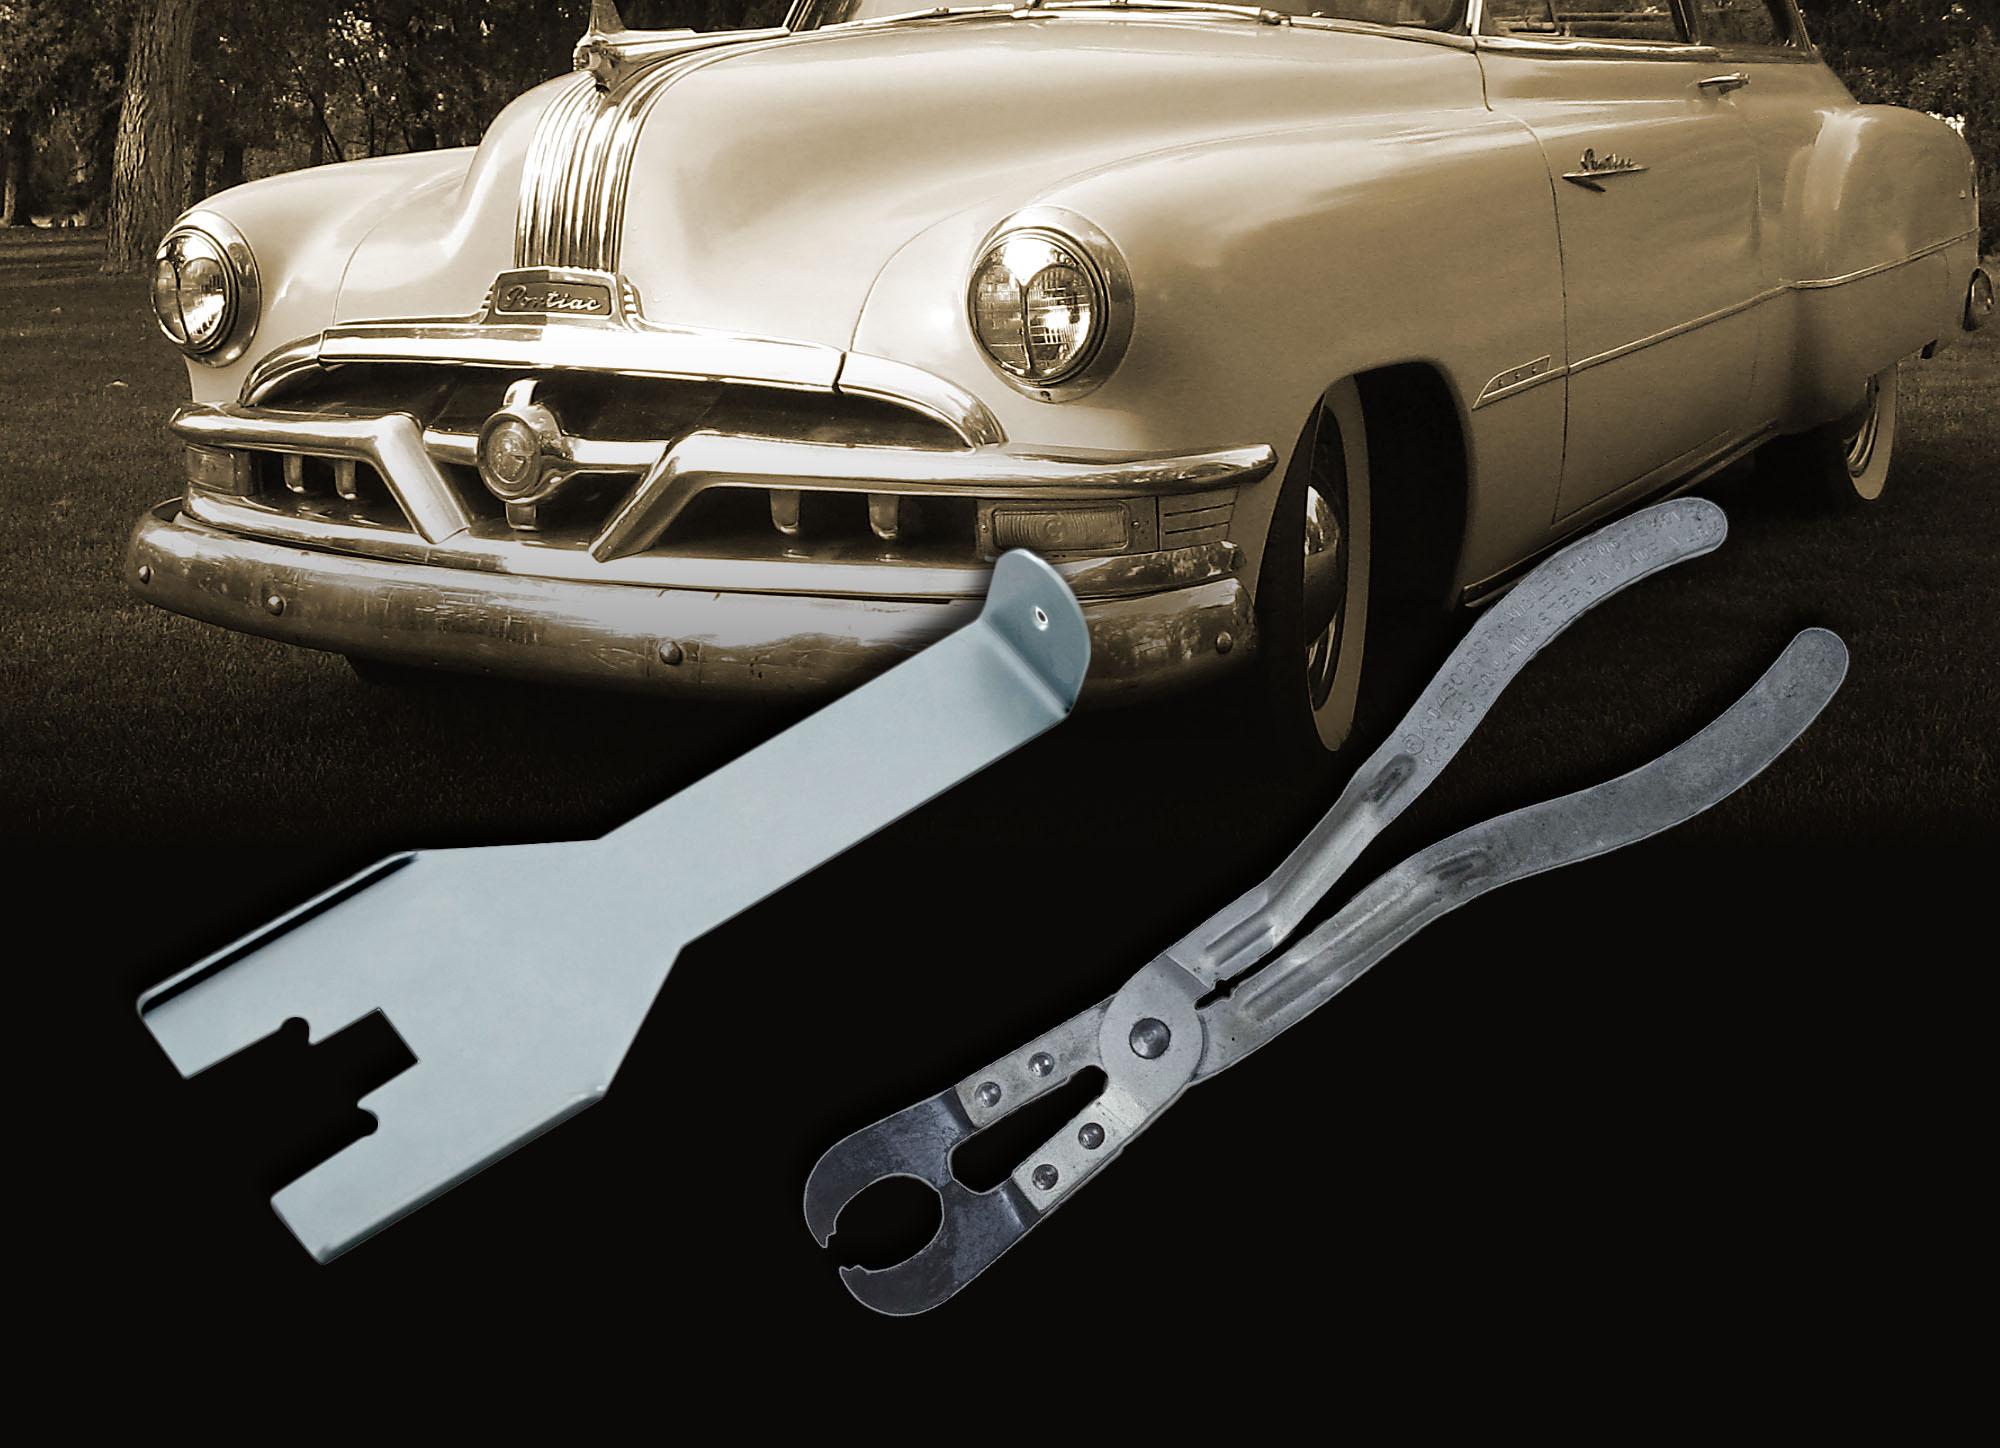 vintage car door handle. Vintage Car Door Handle O